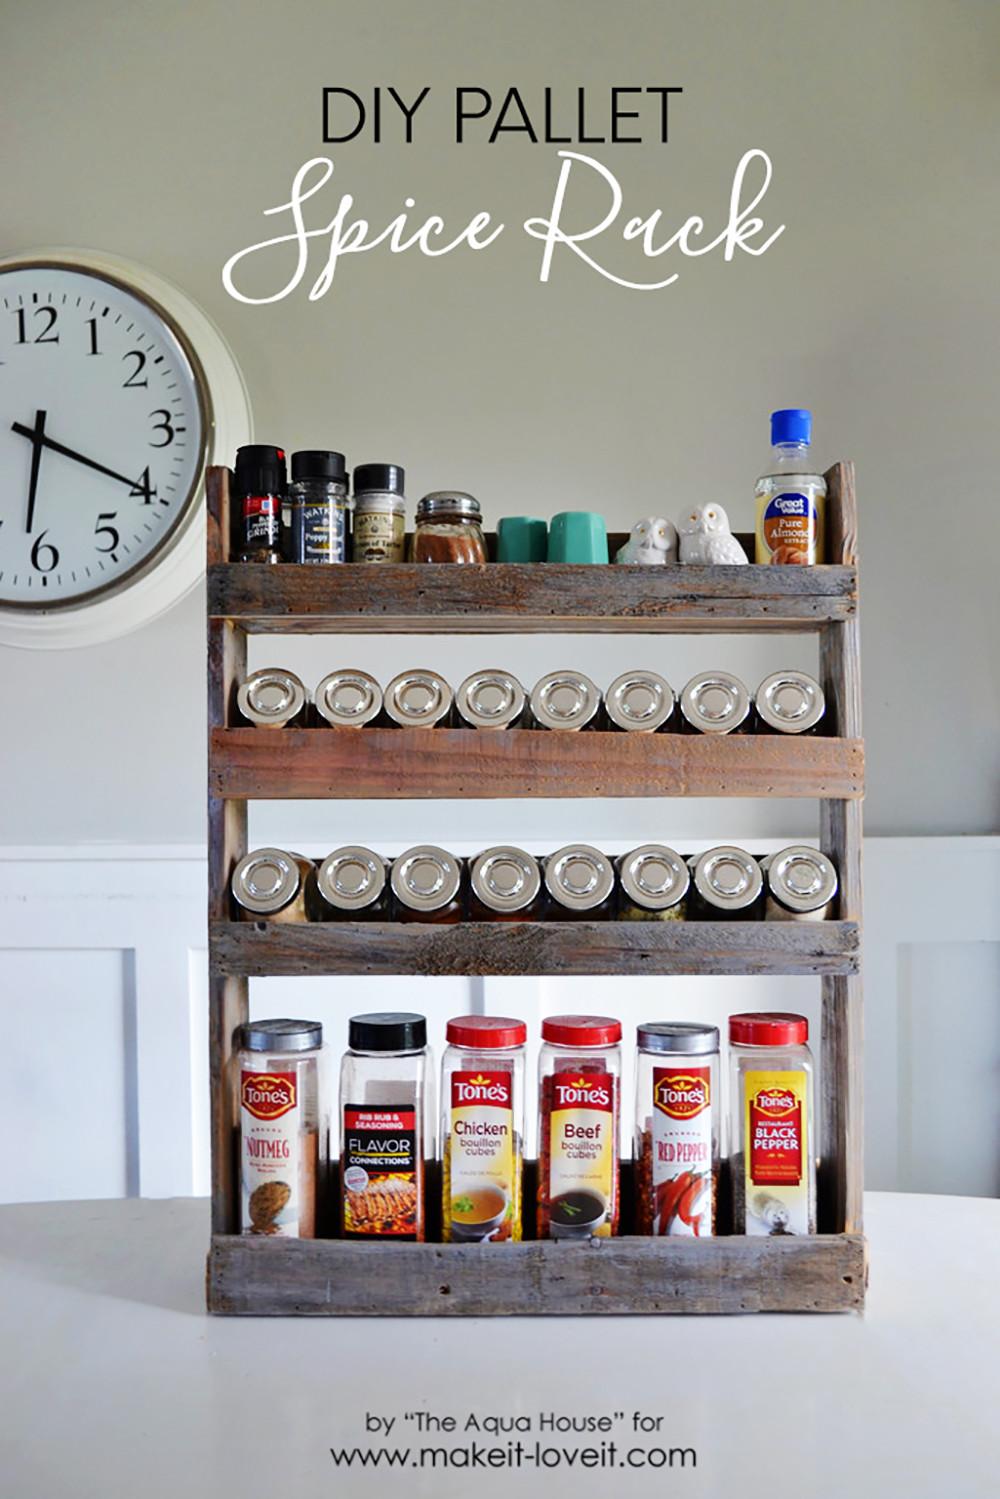 Spice Rack Ideas DIY  DIY Pallet Spice Rack